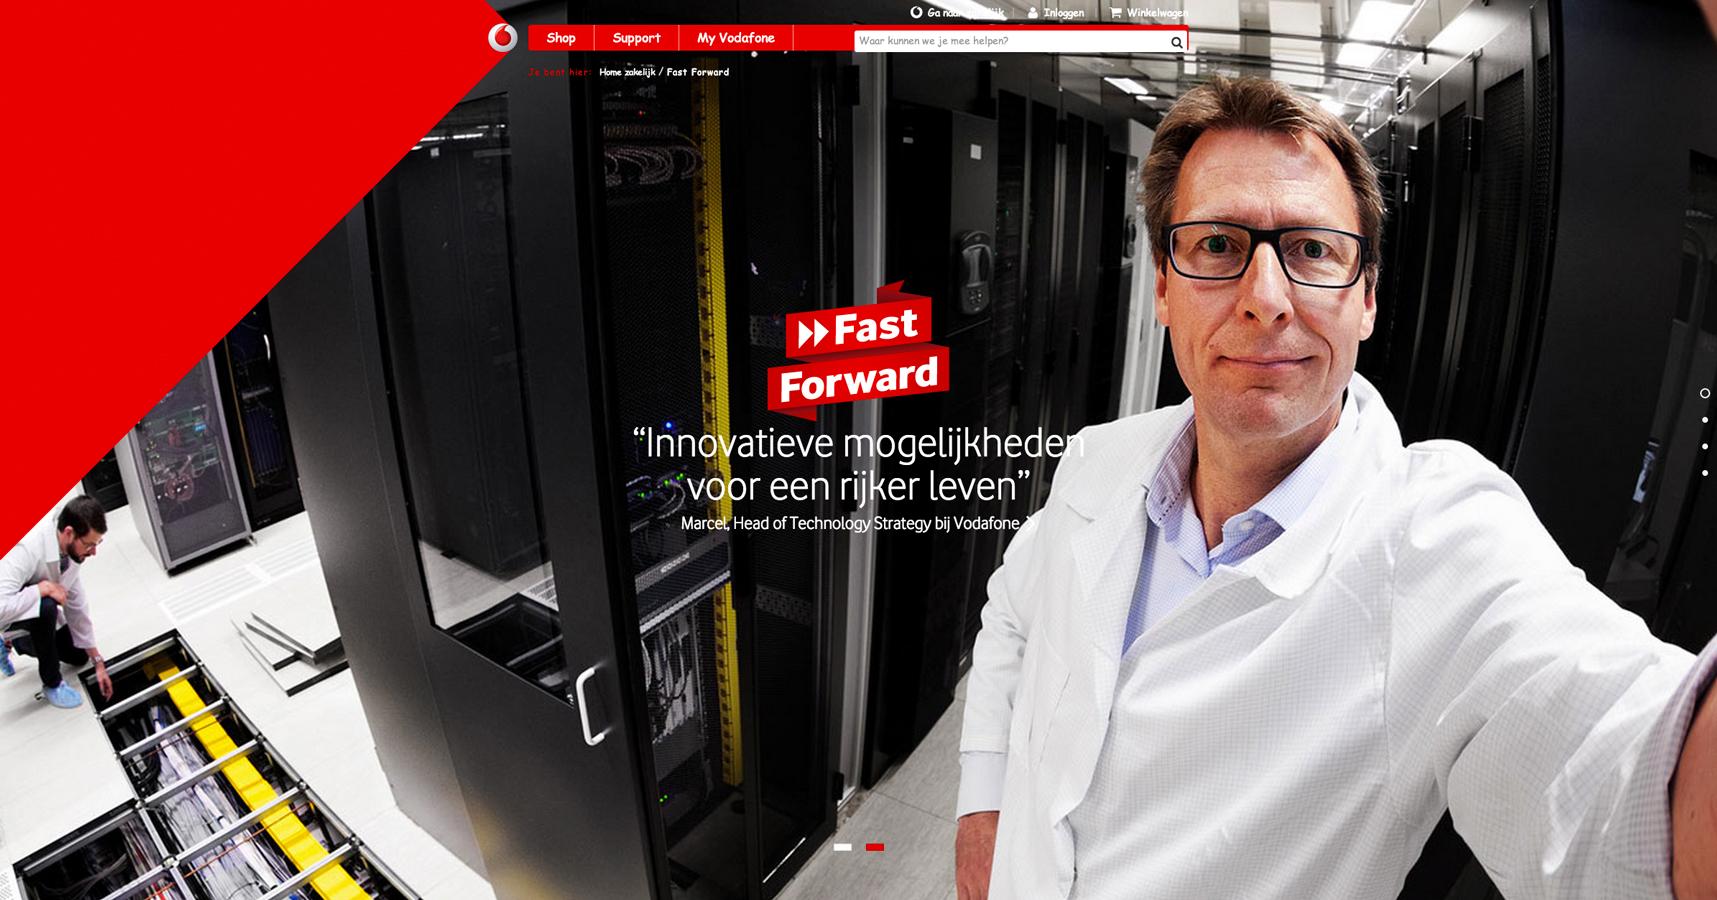 4G Portal Vodafone